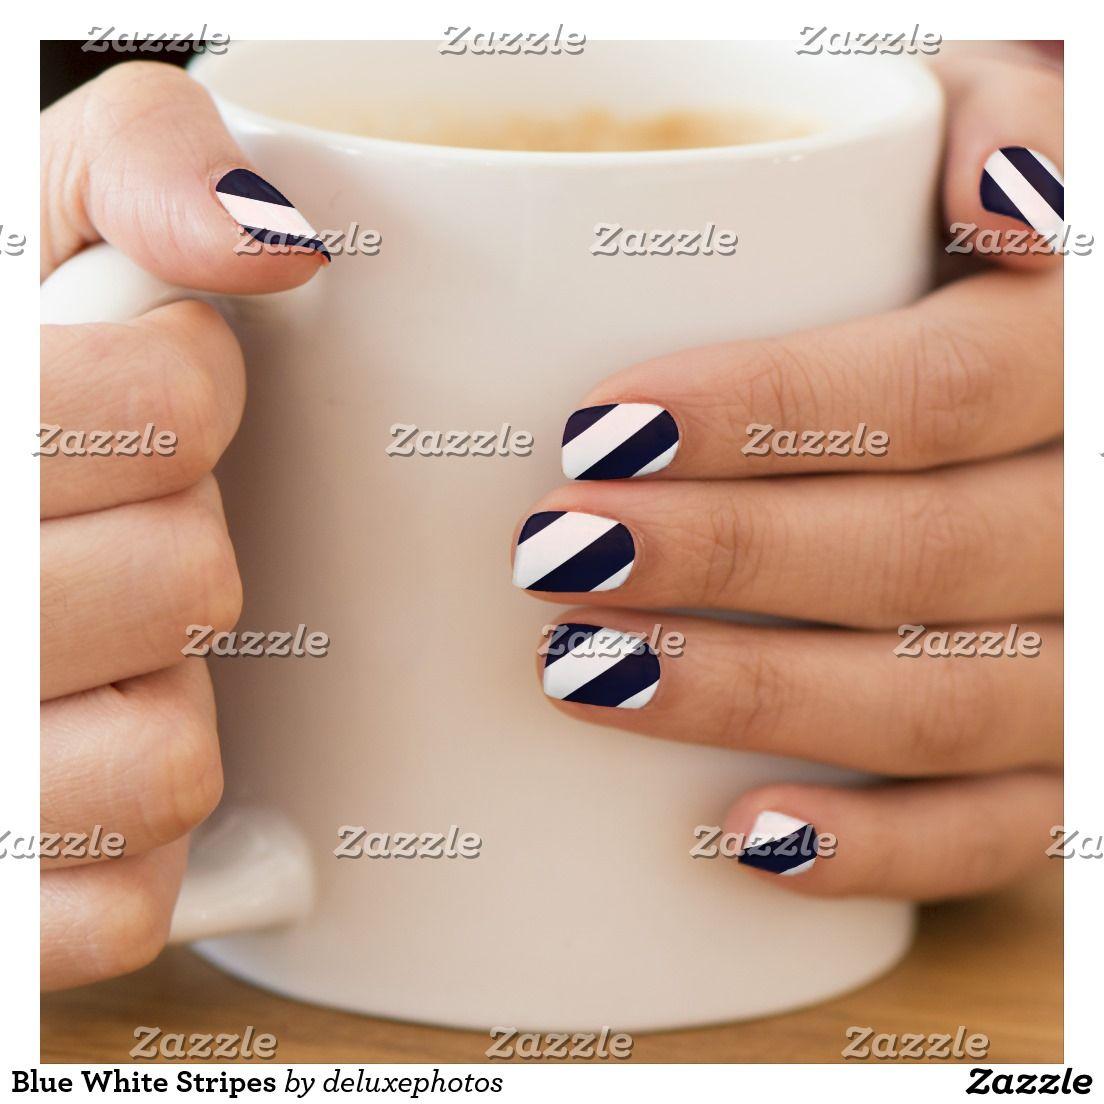 Blue White Stripes Minx Nail Wraps | Zazzle com | Nail nail